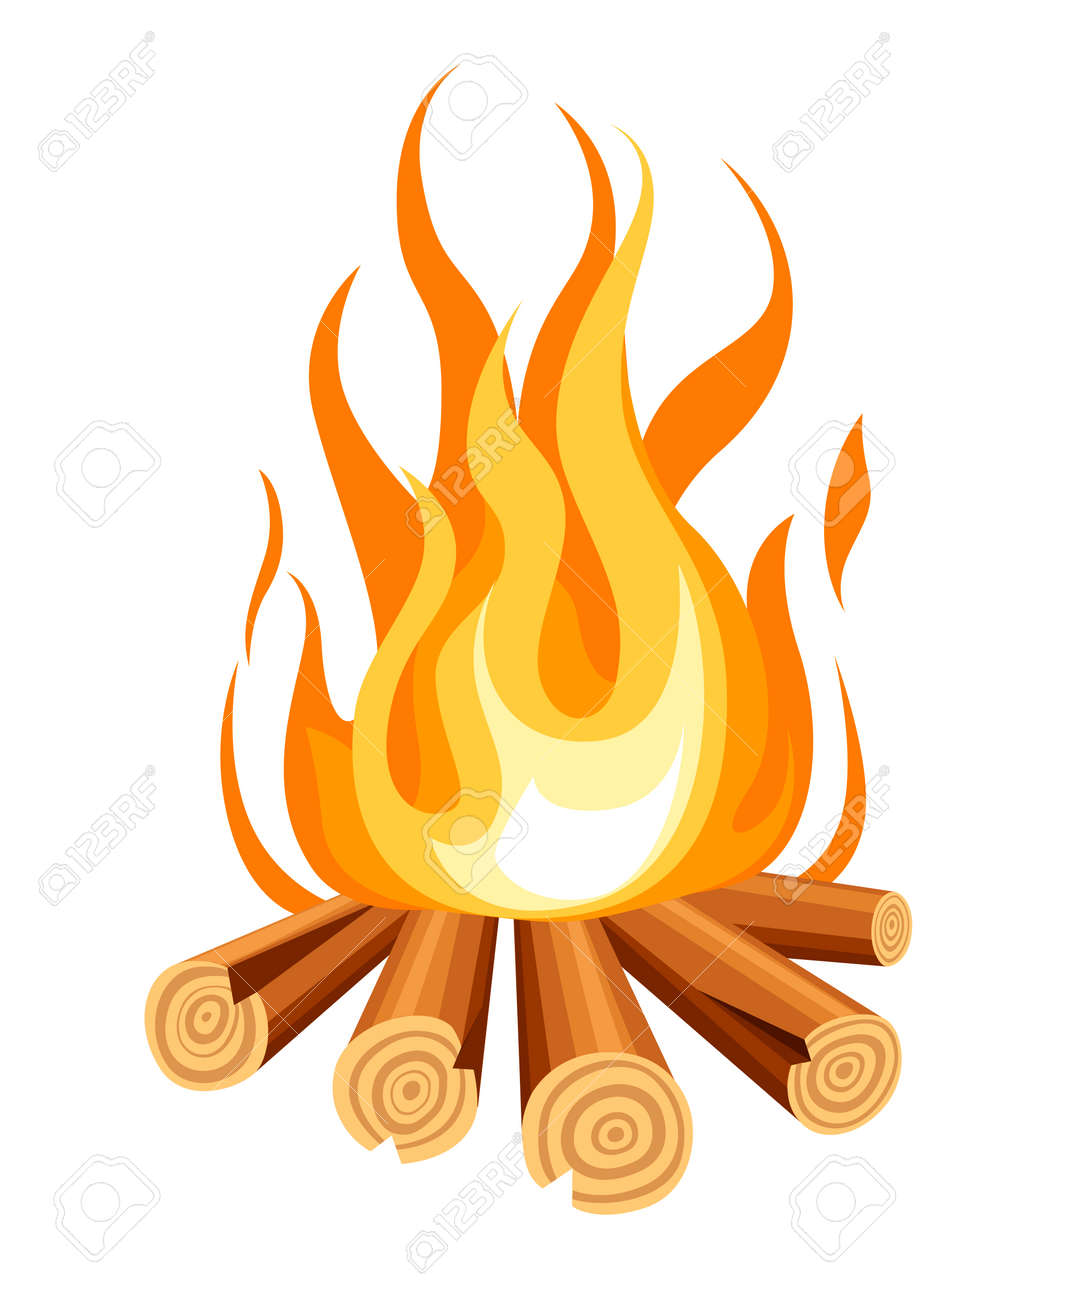 Burning bonfire with wood. Vector cartoon style illustration of bonfire. Isolated on white background. - 103920980